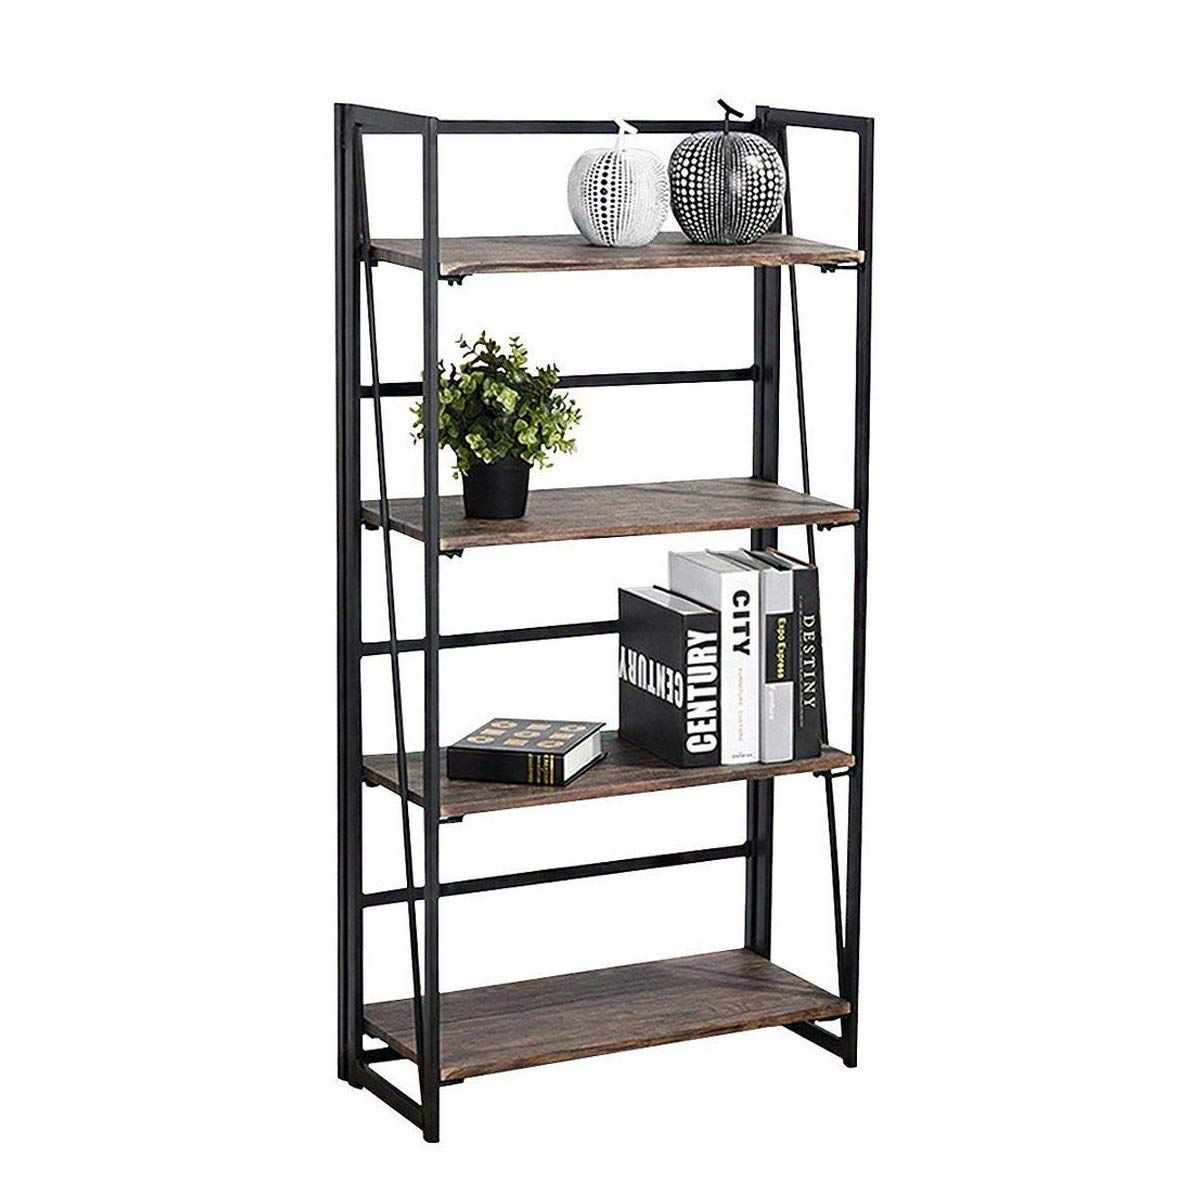 Amazon Com Coavas Folding Bookshelf Rack 4 Tiers Bookcase Home Office Shelf Storage Rack No Assembly Industrial Stand Home Office Shelves Bookcase Bookshelves